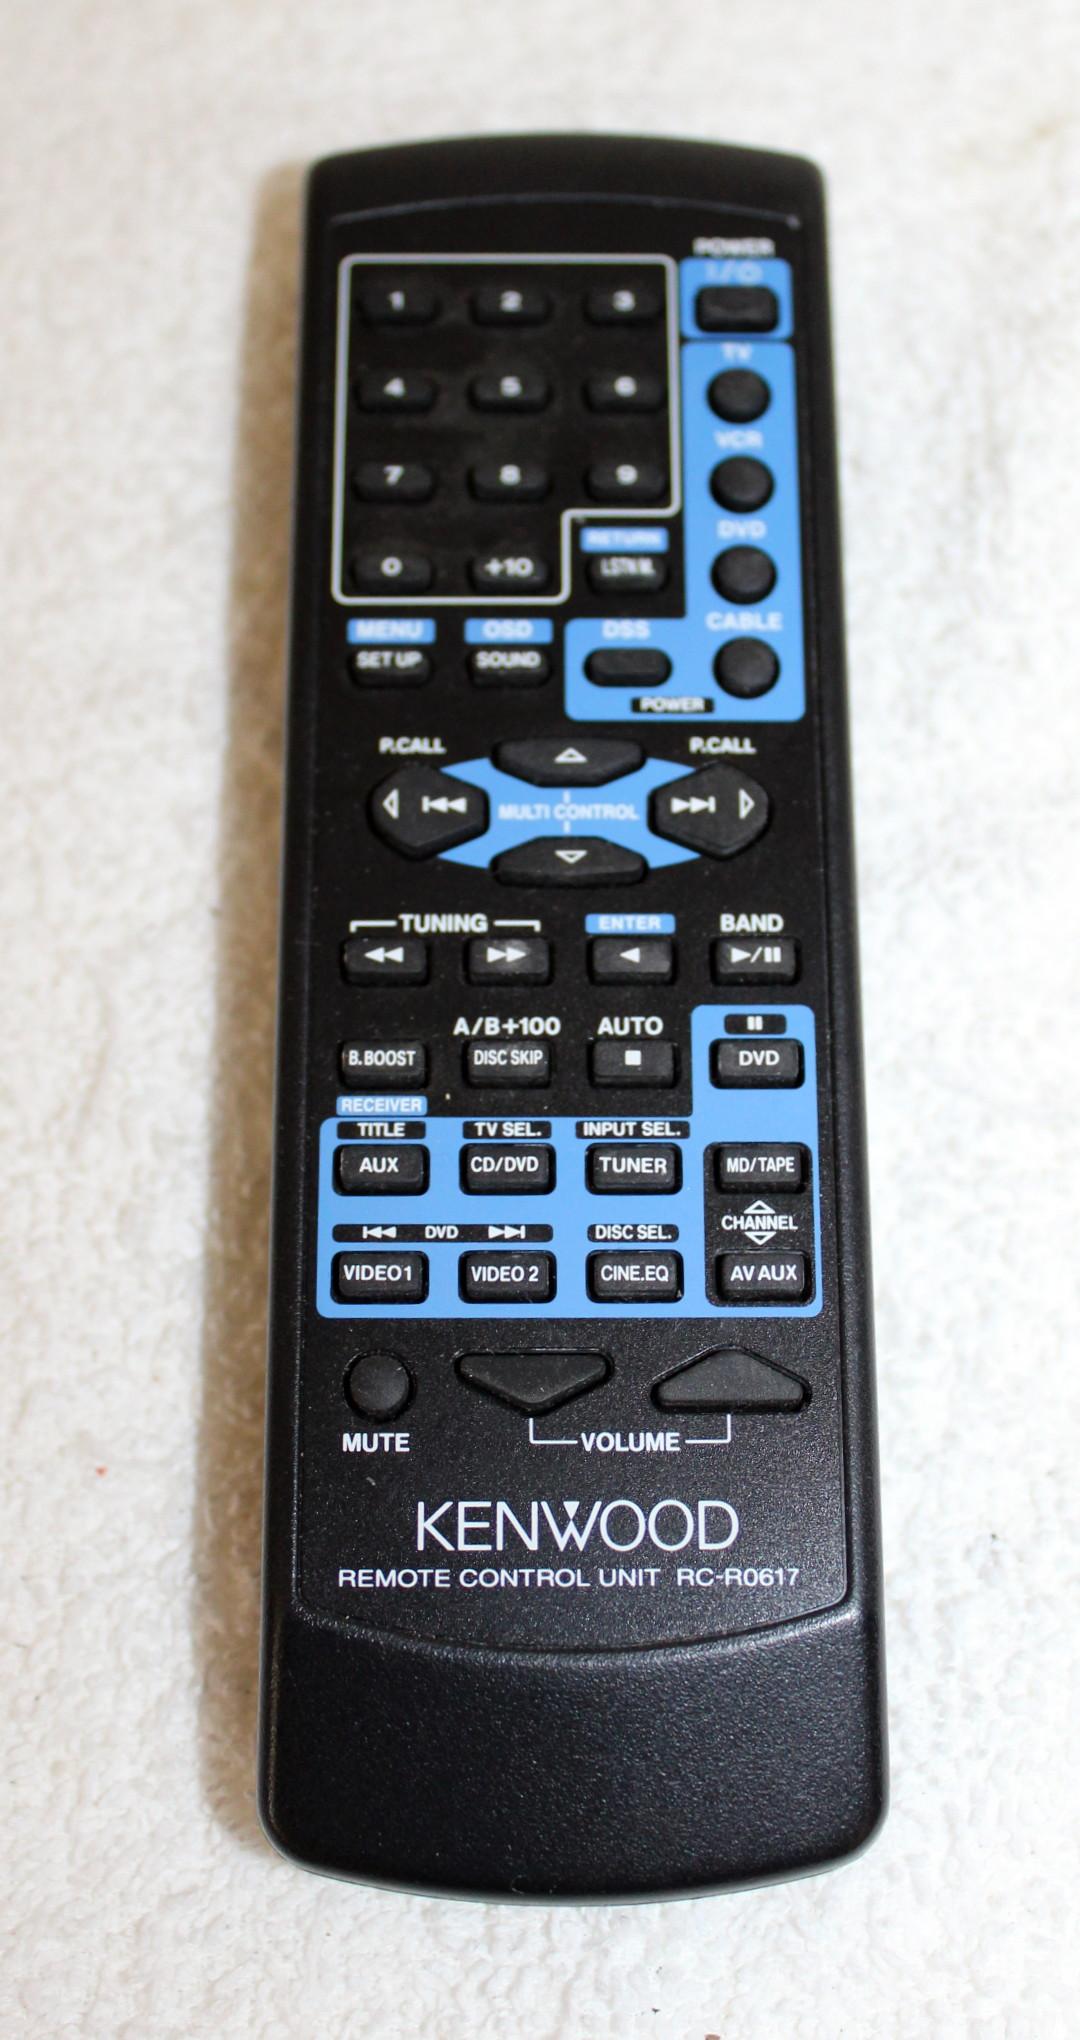 kenwood vr 517 stereo am fm receiver remote manual av control rh ebay com Kenwood Receiver Operator Manuals Kenwood Instruction Manual